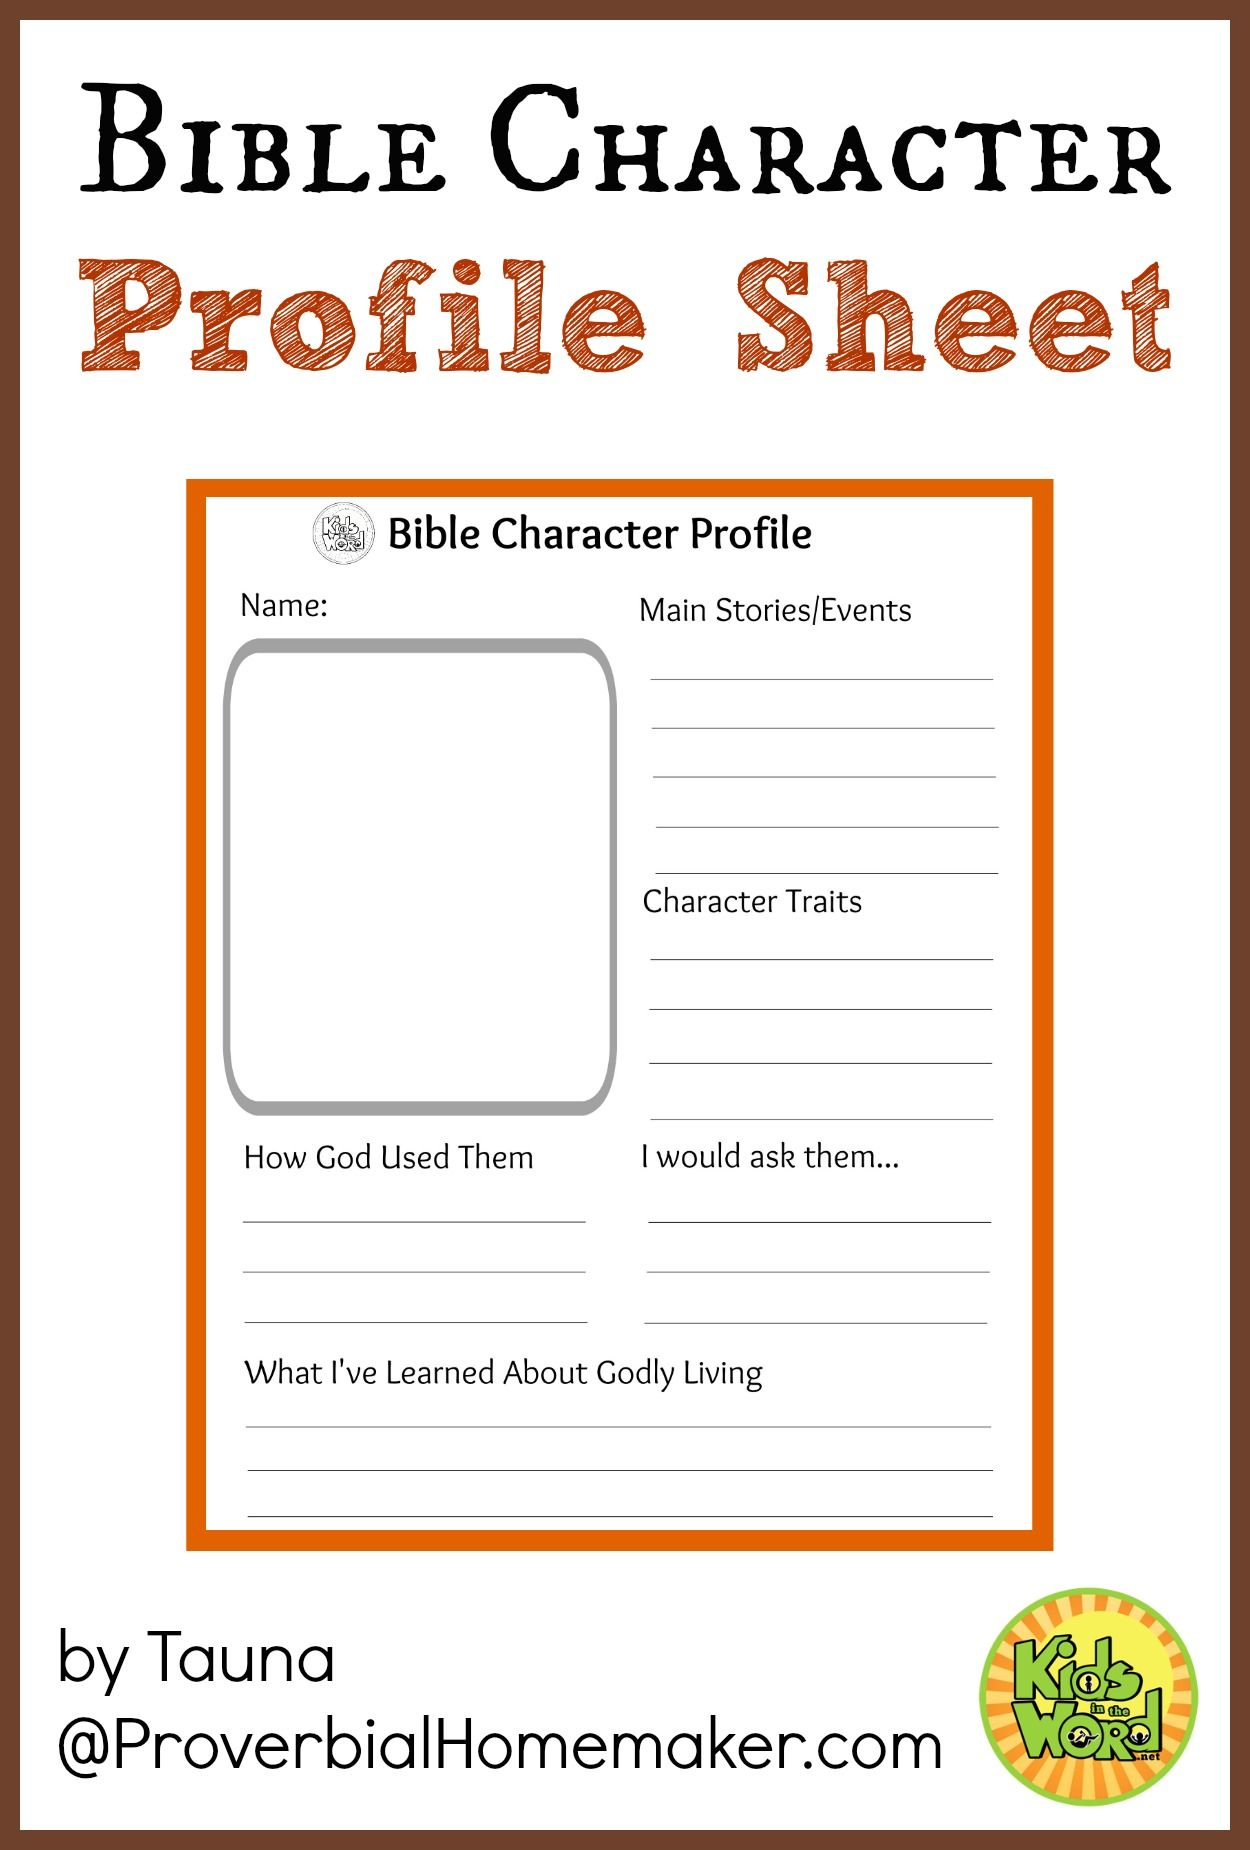 Bible Character Profile Sheet